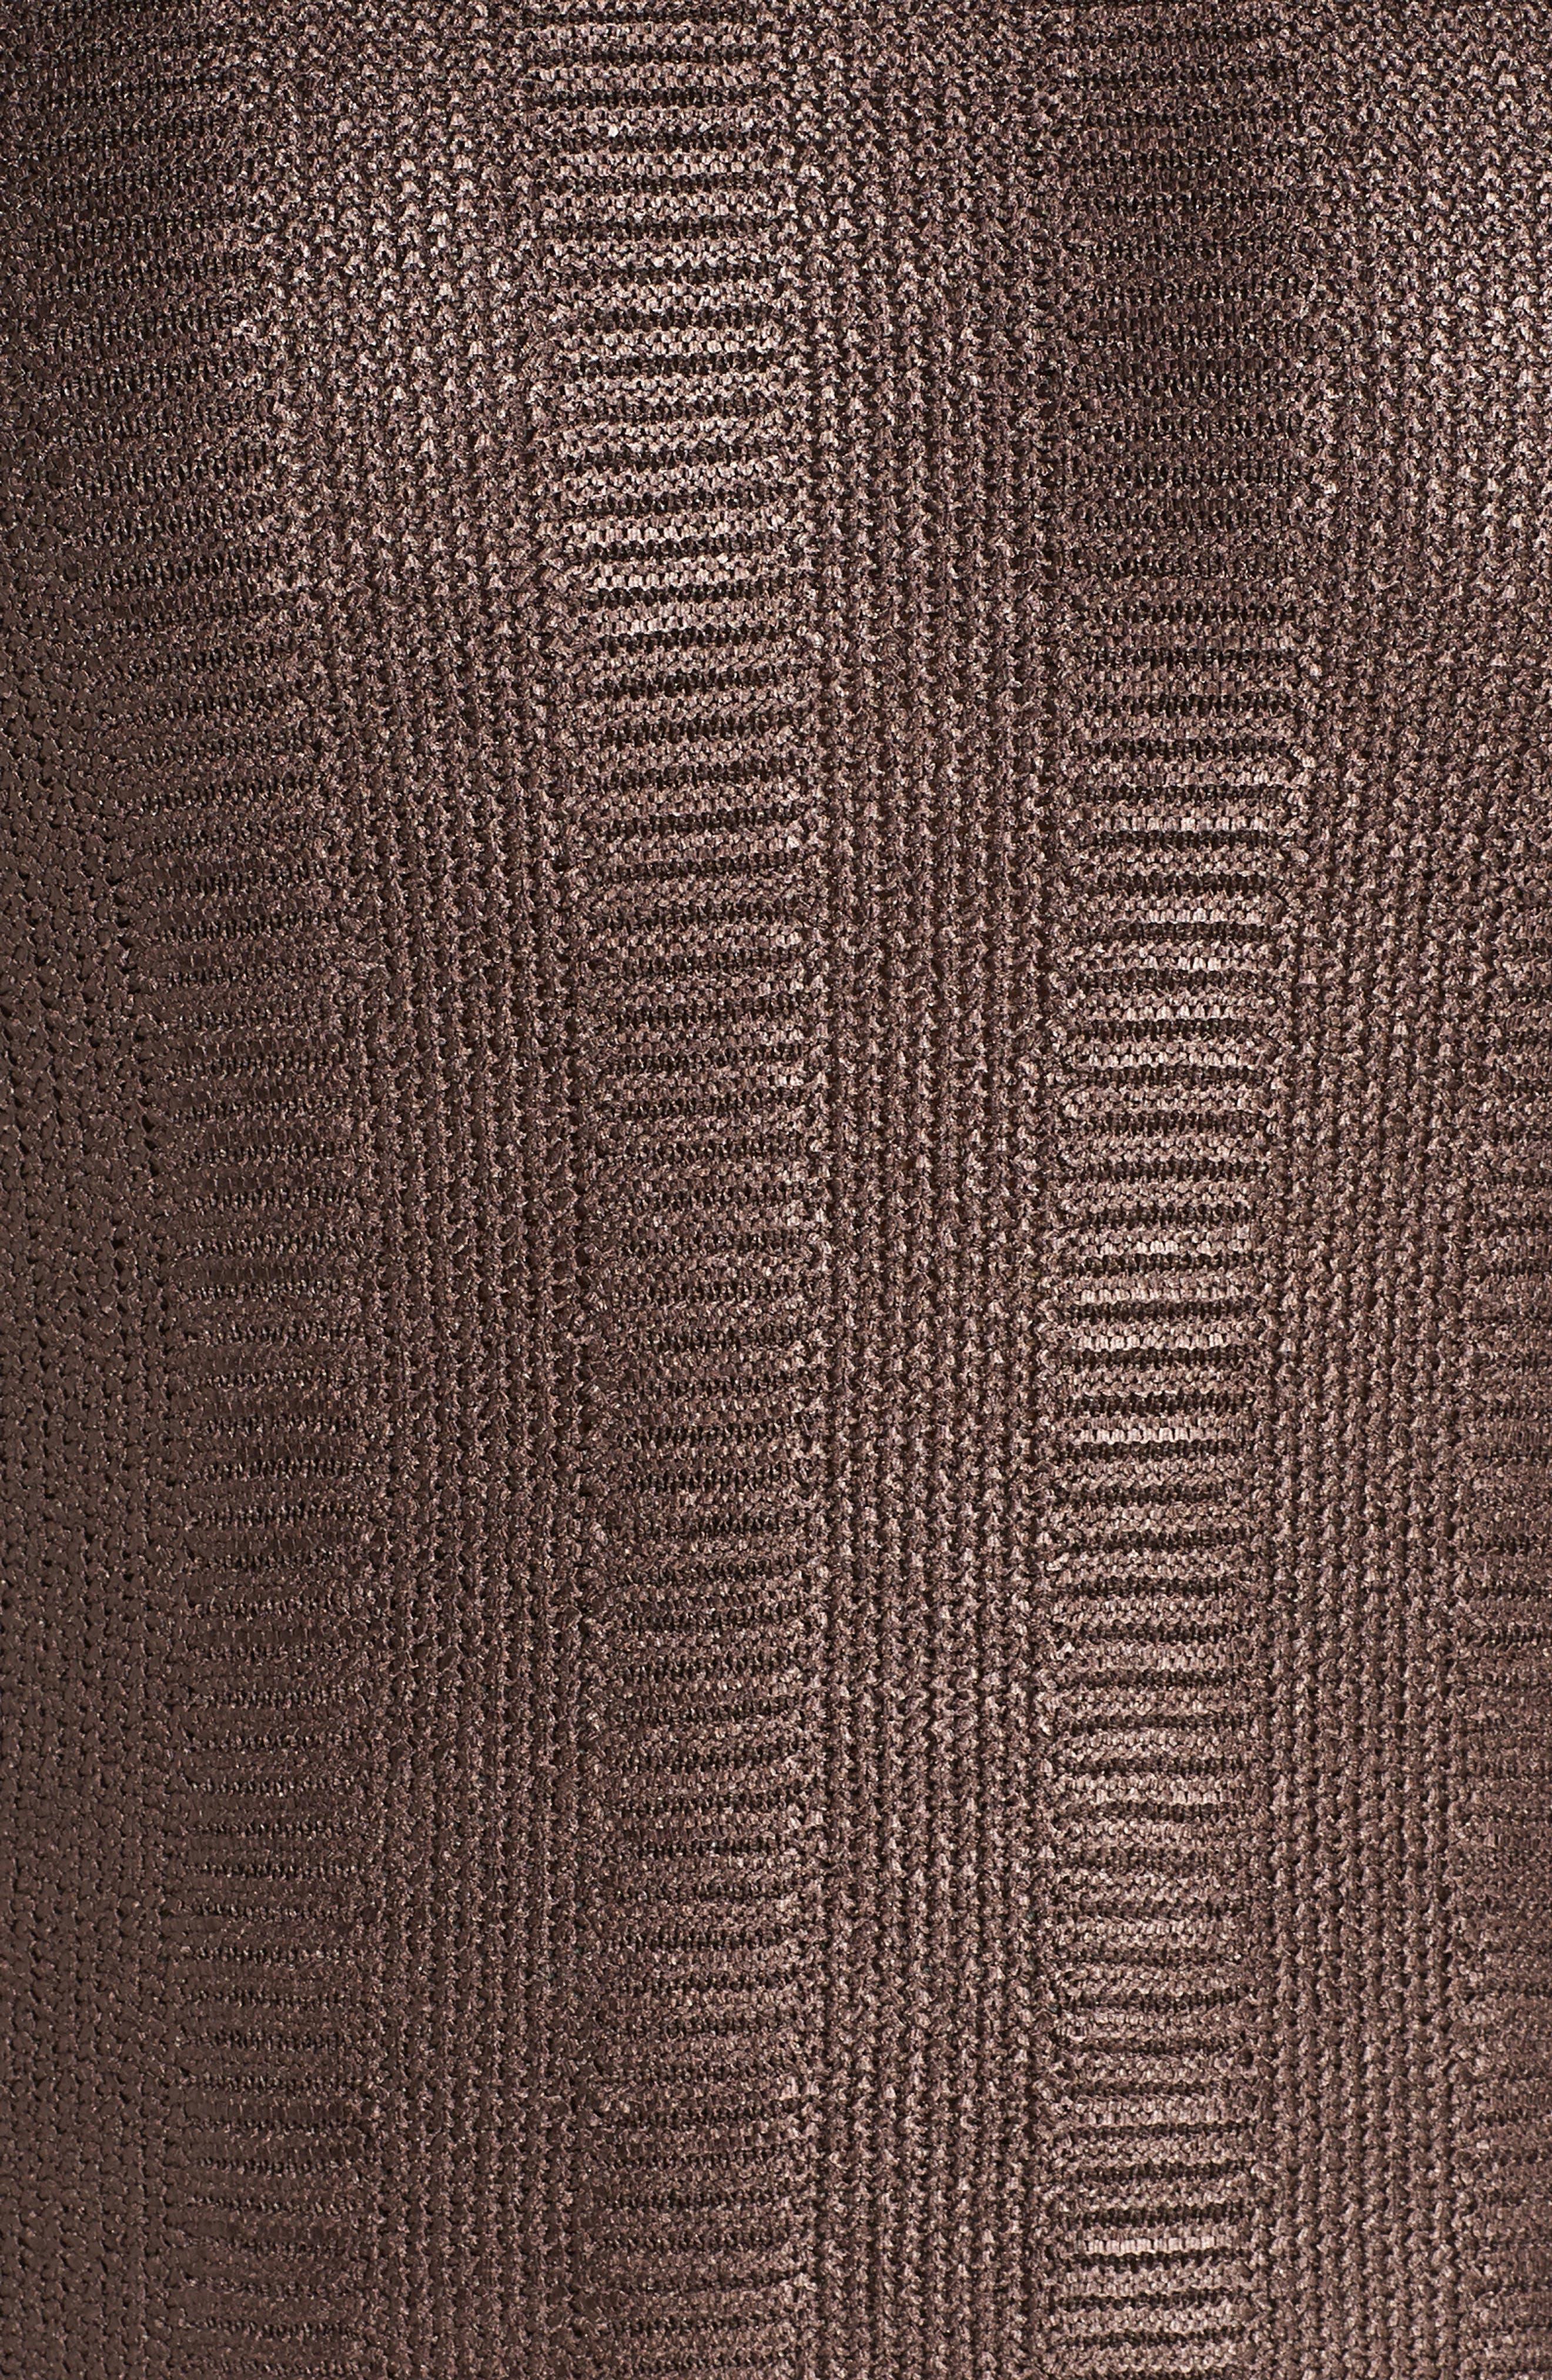 Easy Edge Metallic Knit Top,                             Alternate thumbnail 5, color,                             500